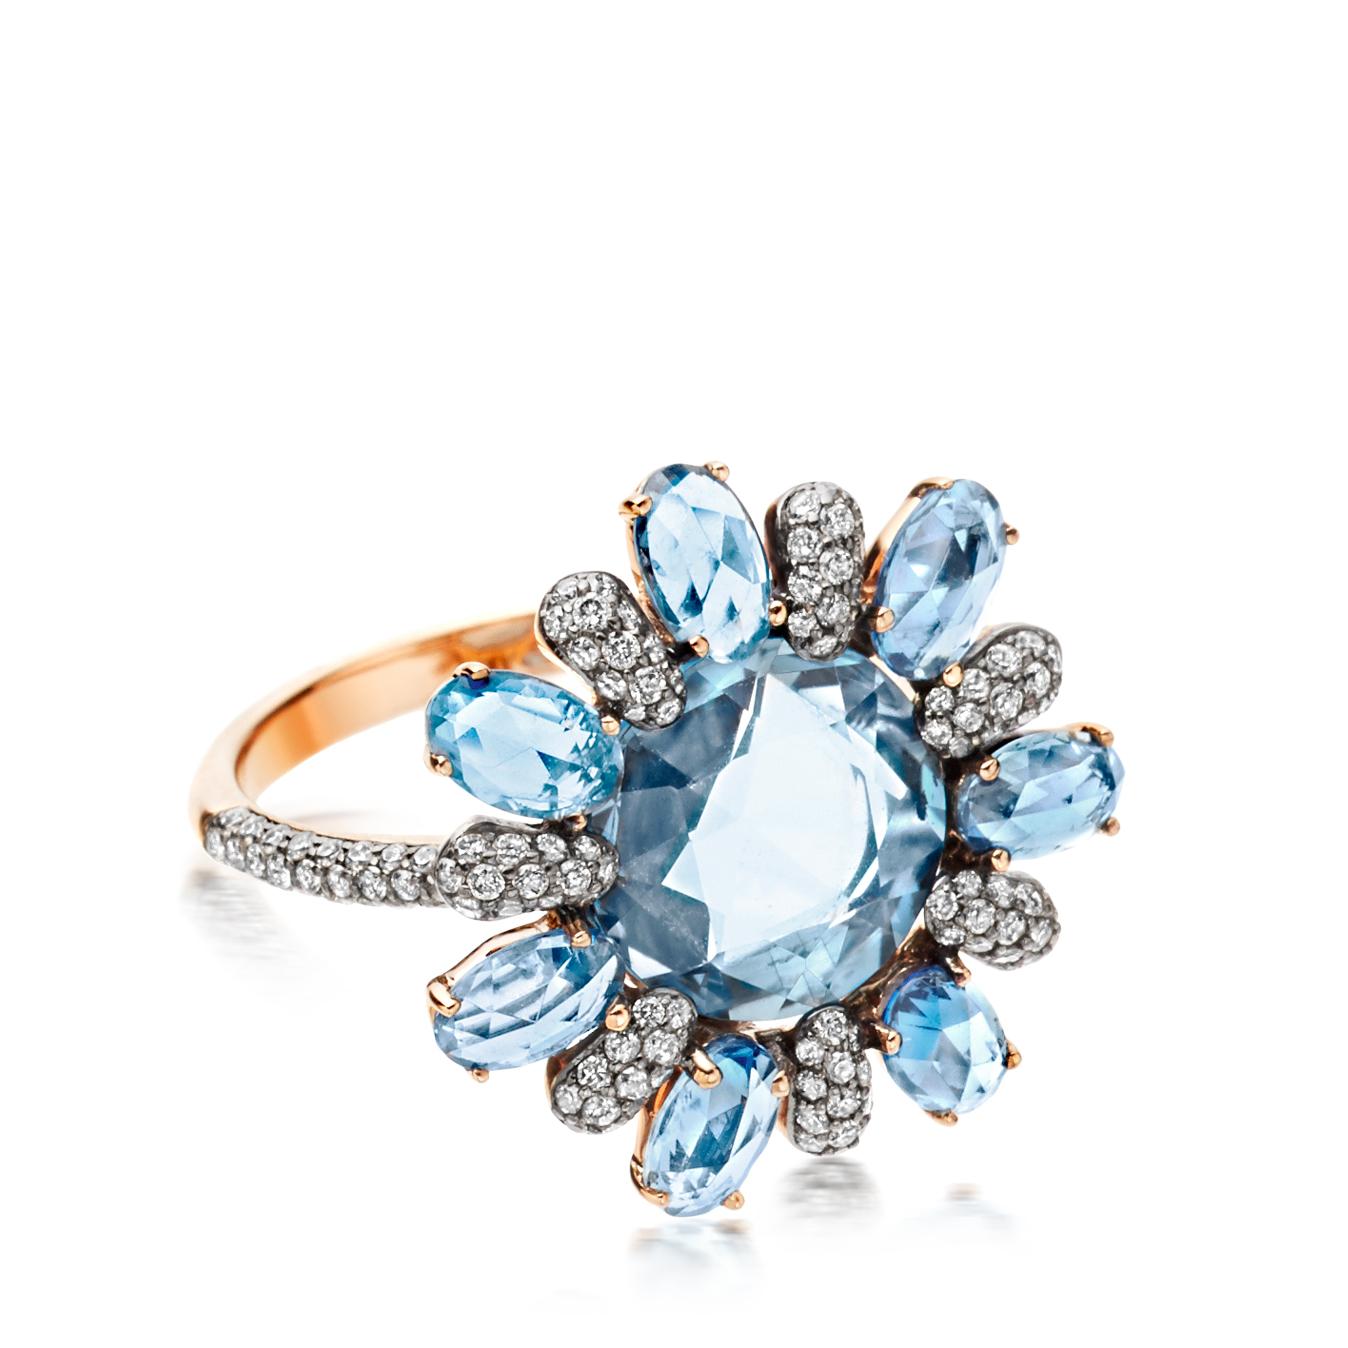 Lyst astley clarke santa maria aquamarine fao ring in blue for Santa maria jewelry company